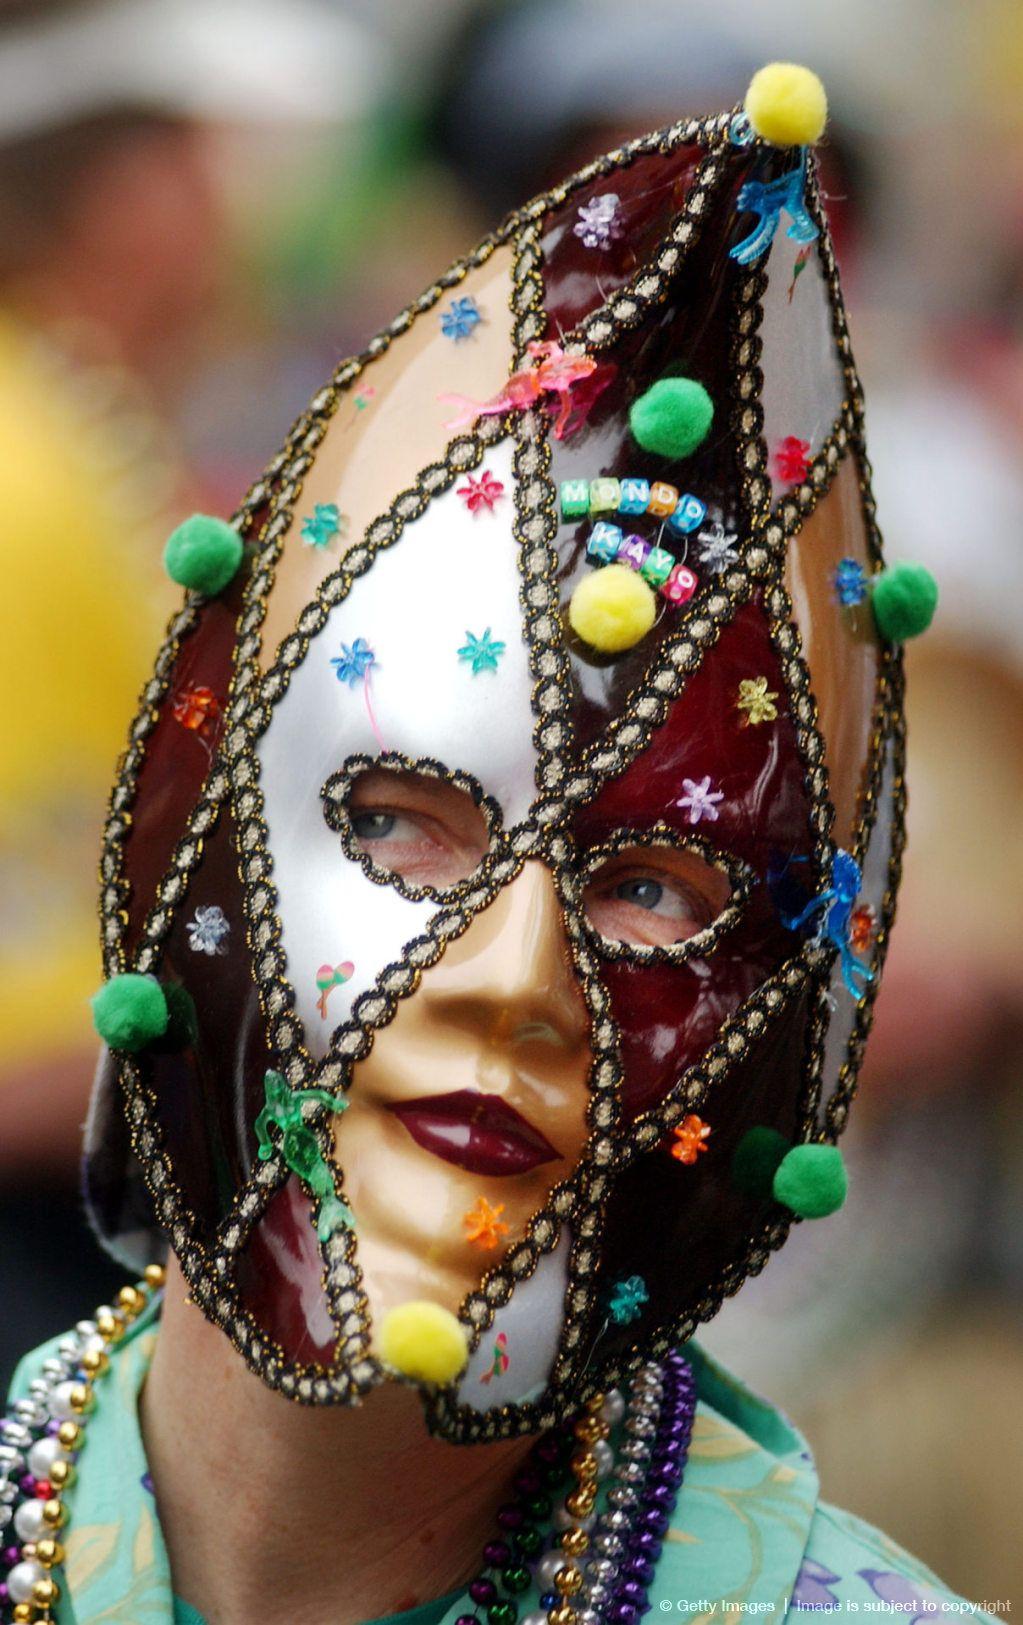 new orleans celebrates mardi gras masques de carnaval carnaval masque carnaval et masque. Black Bedroom Furniture Sets. Home Design Ideas